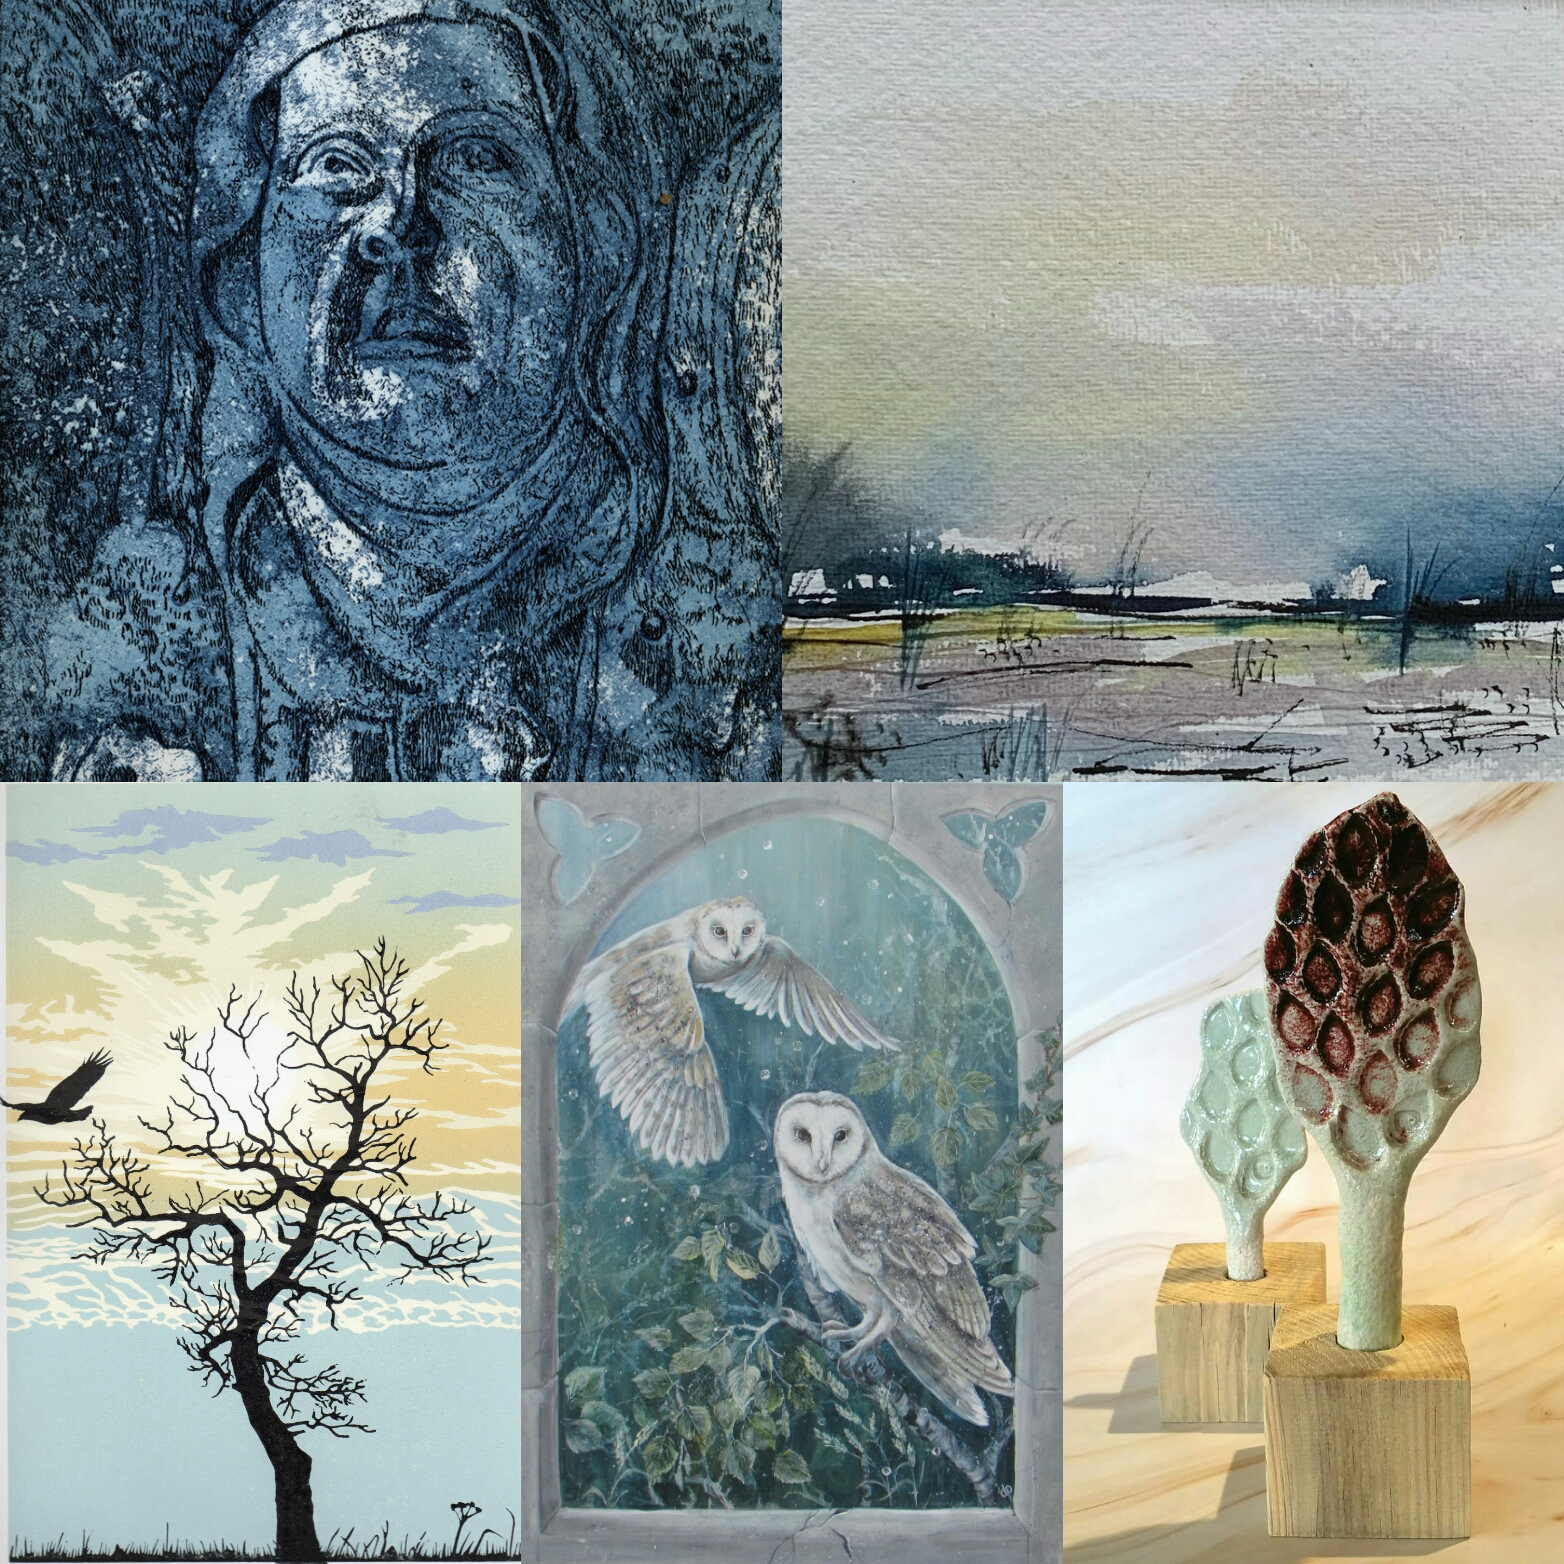 Garboldisham Arts Trail Examples